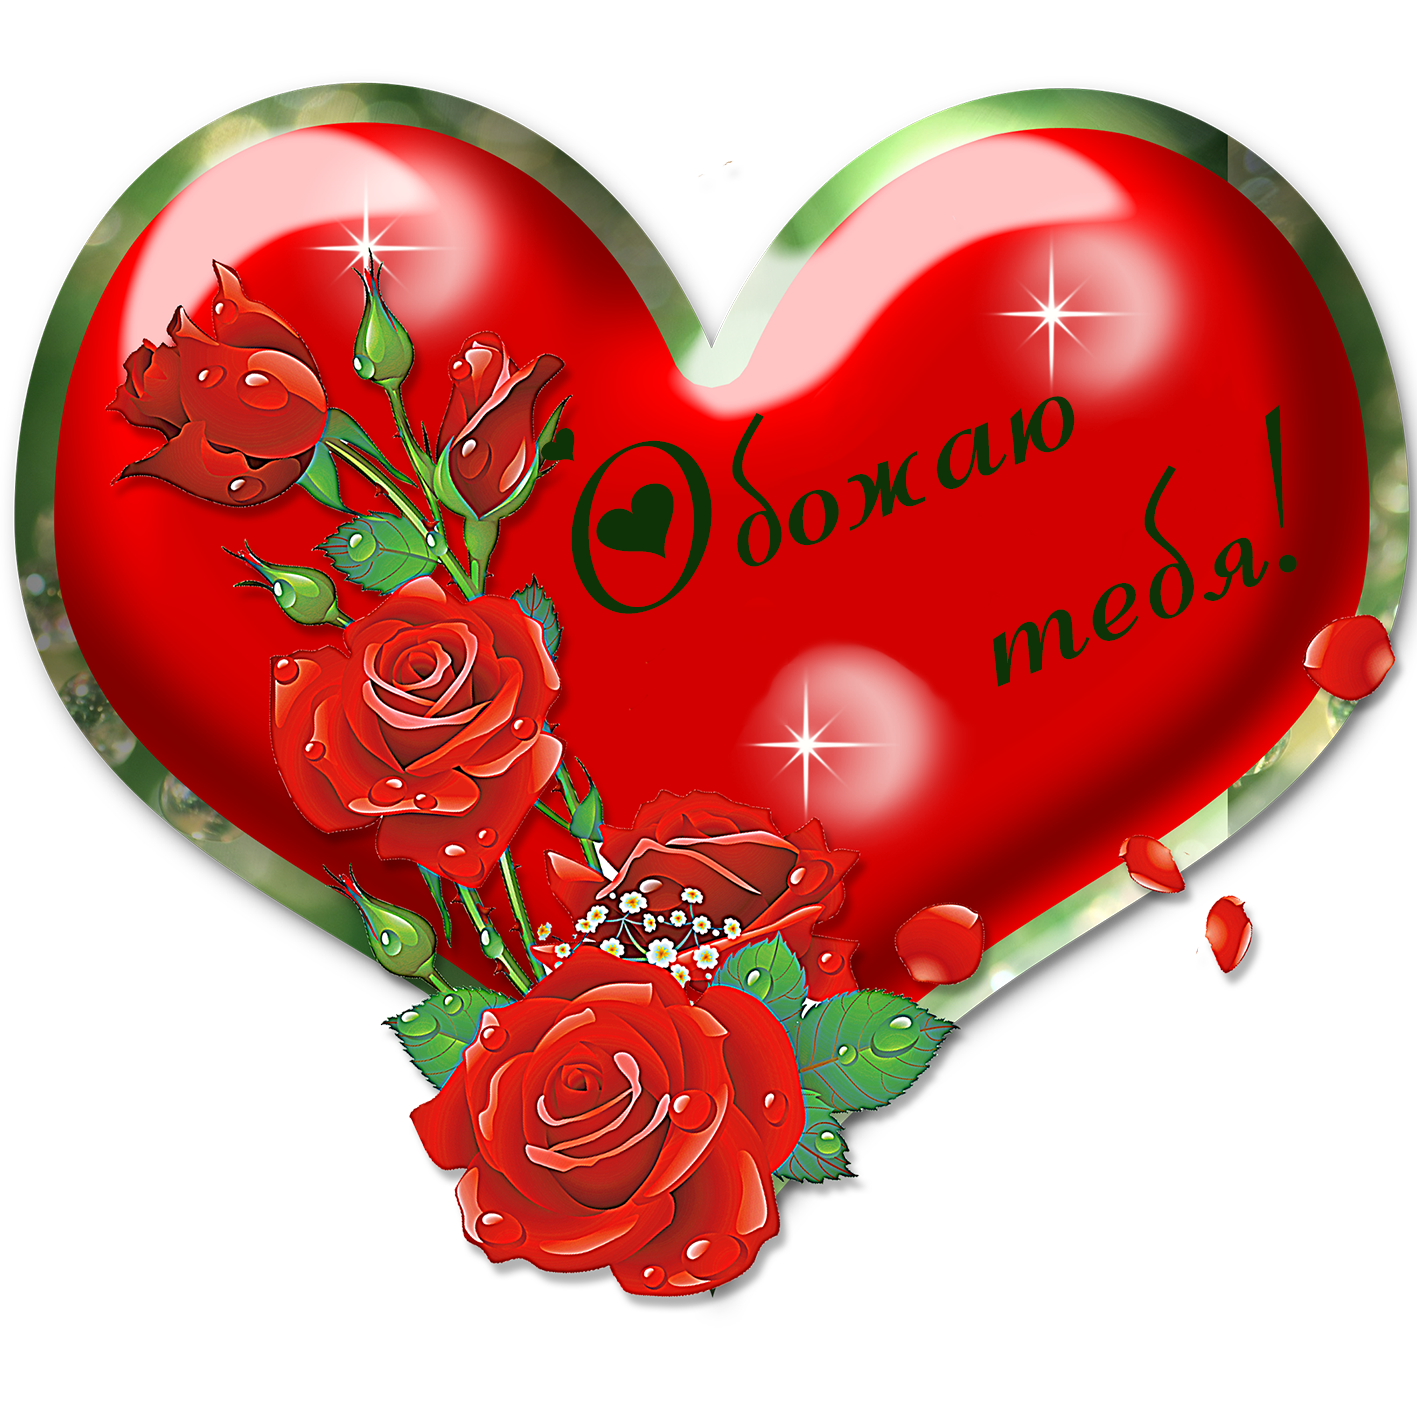 Найти красивые картинки валентинки